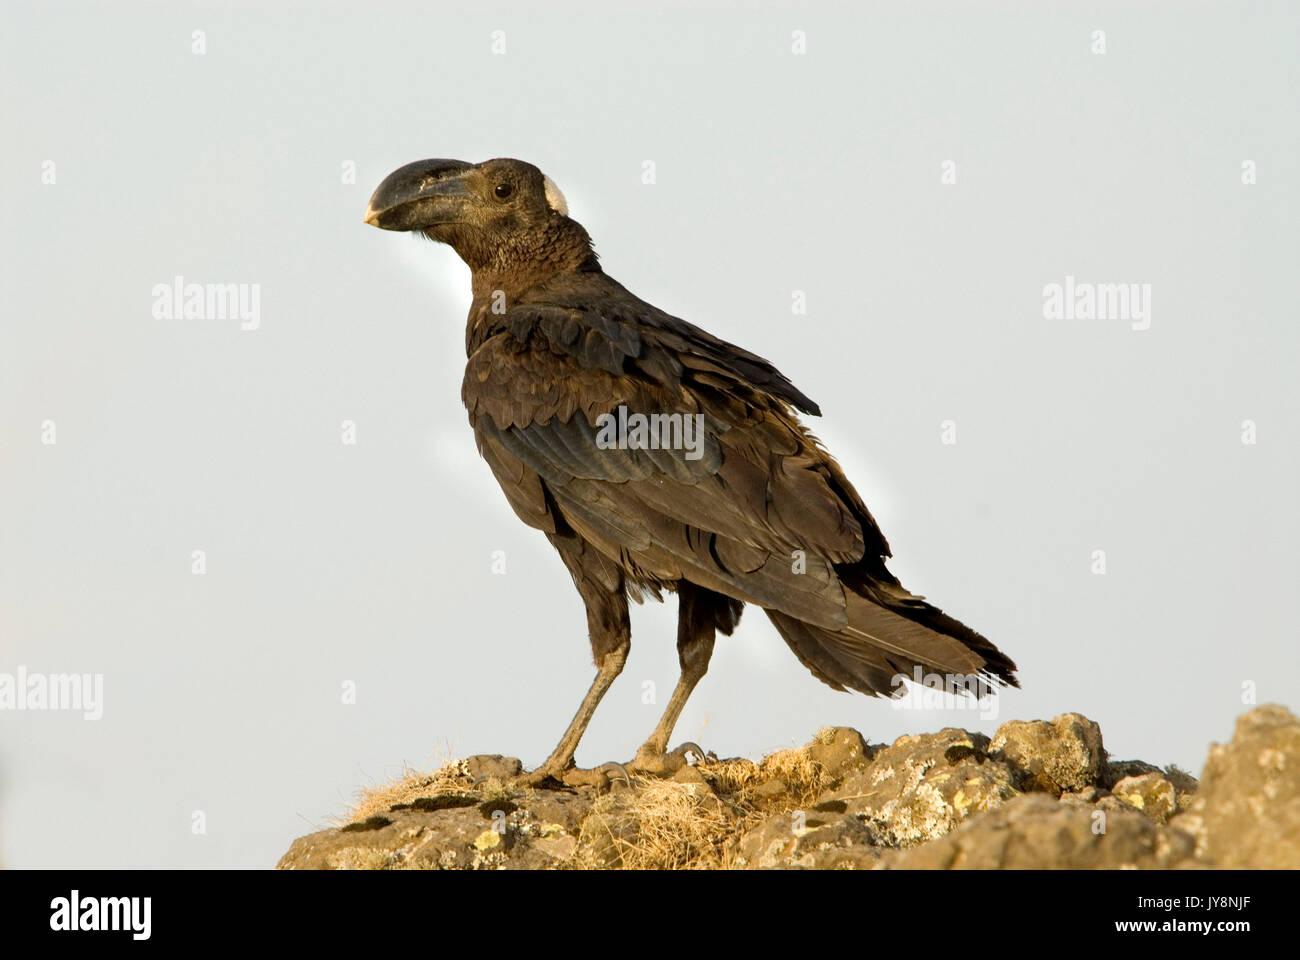 Thick Billed Raven, Corvus crassirostris, Simien Mountains National Park, Ethiopia, blue sky background, cut out - Stock Image